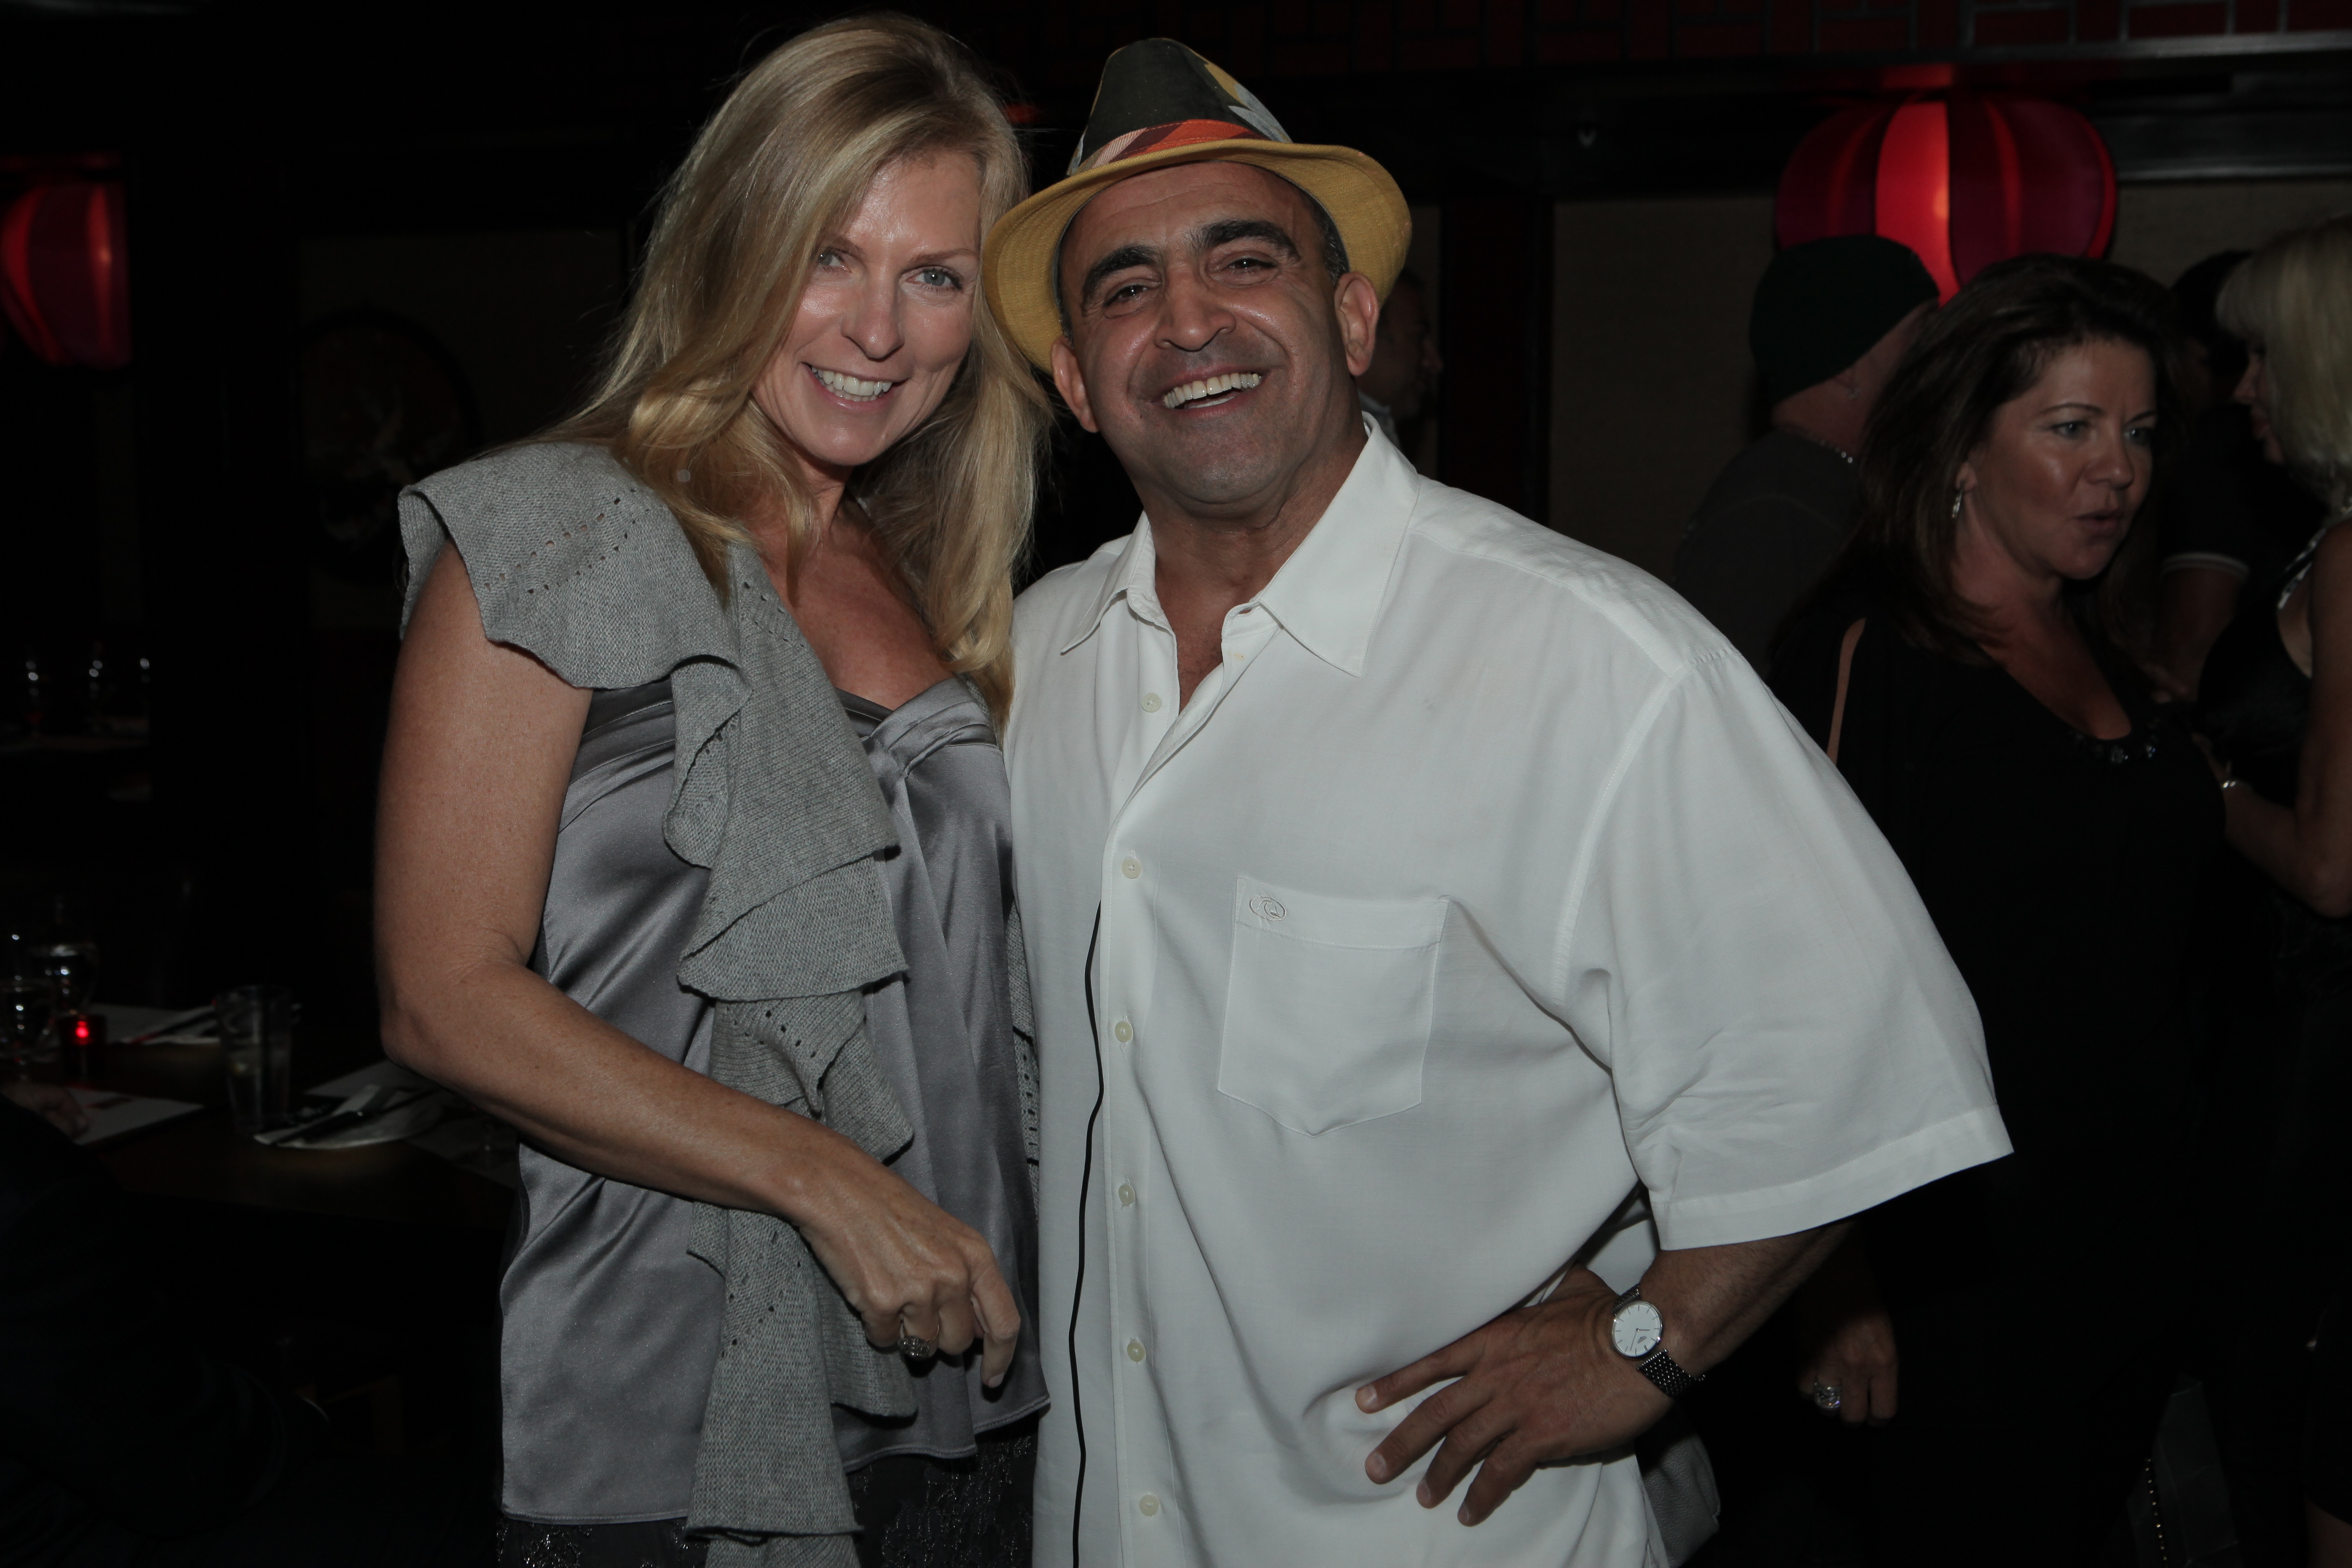 Holly Gores and Joe Antouri